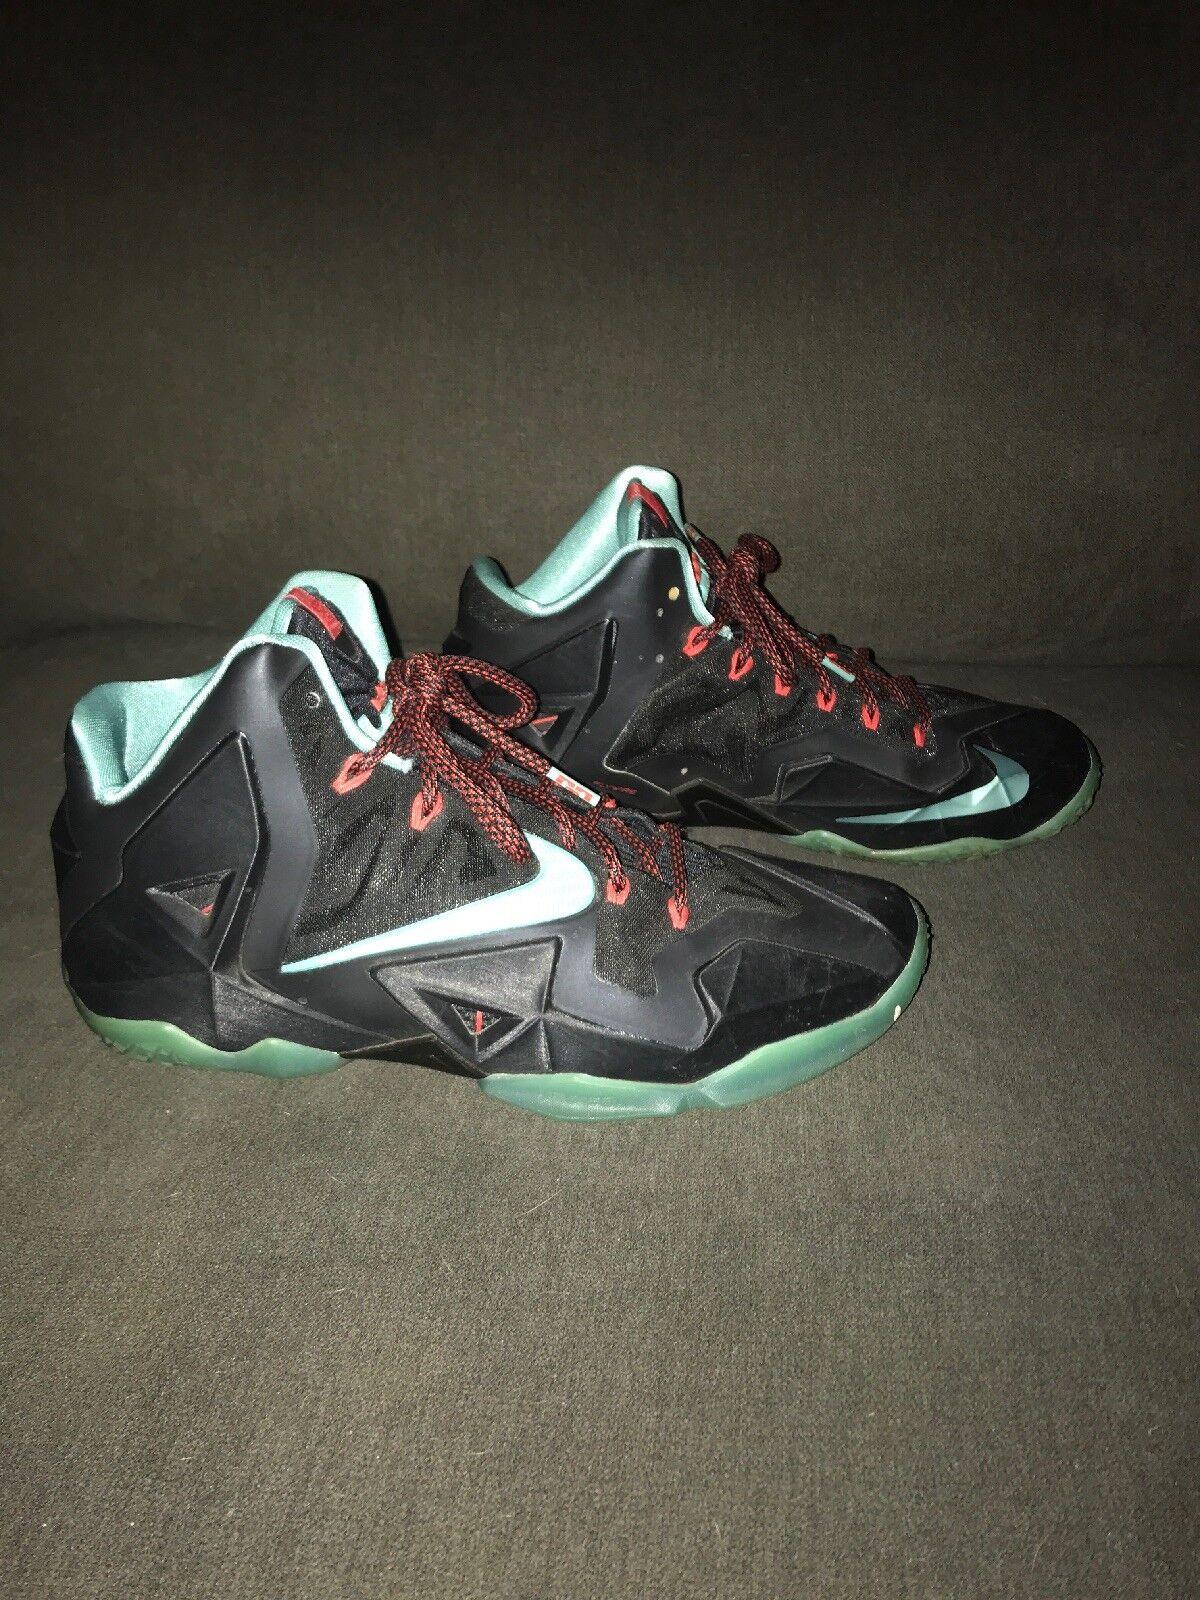 Nike Lebron XI Black Diffused Jade Crimson 616175-004 Men's Size 9 Pristine